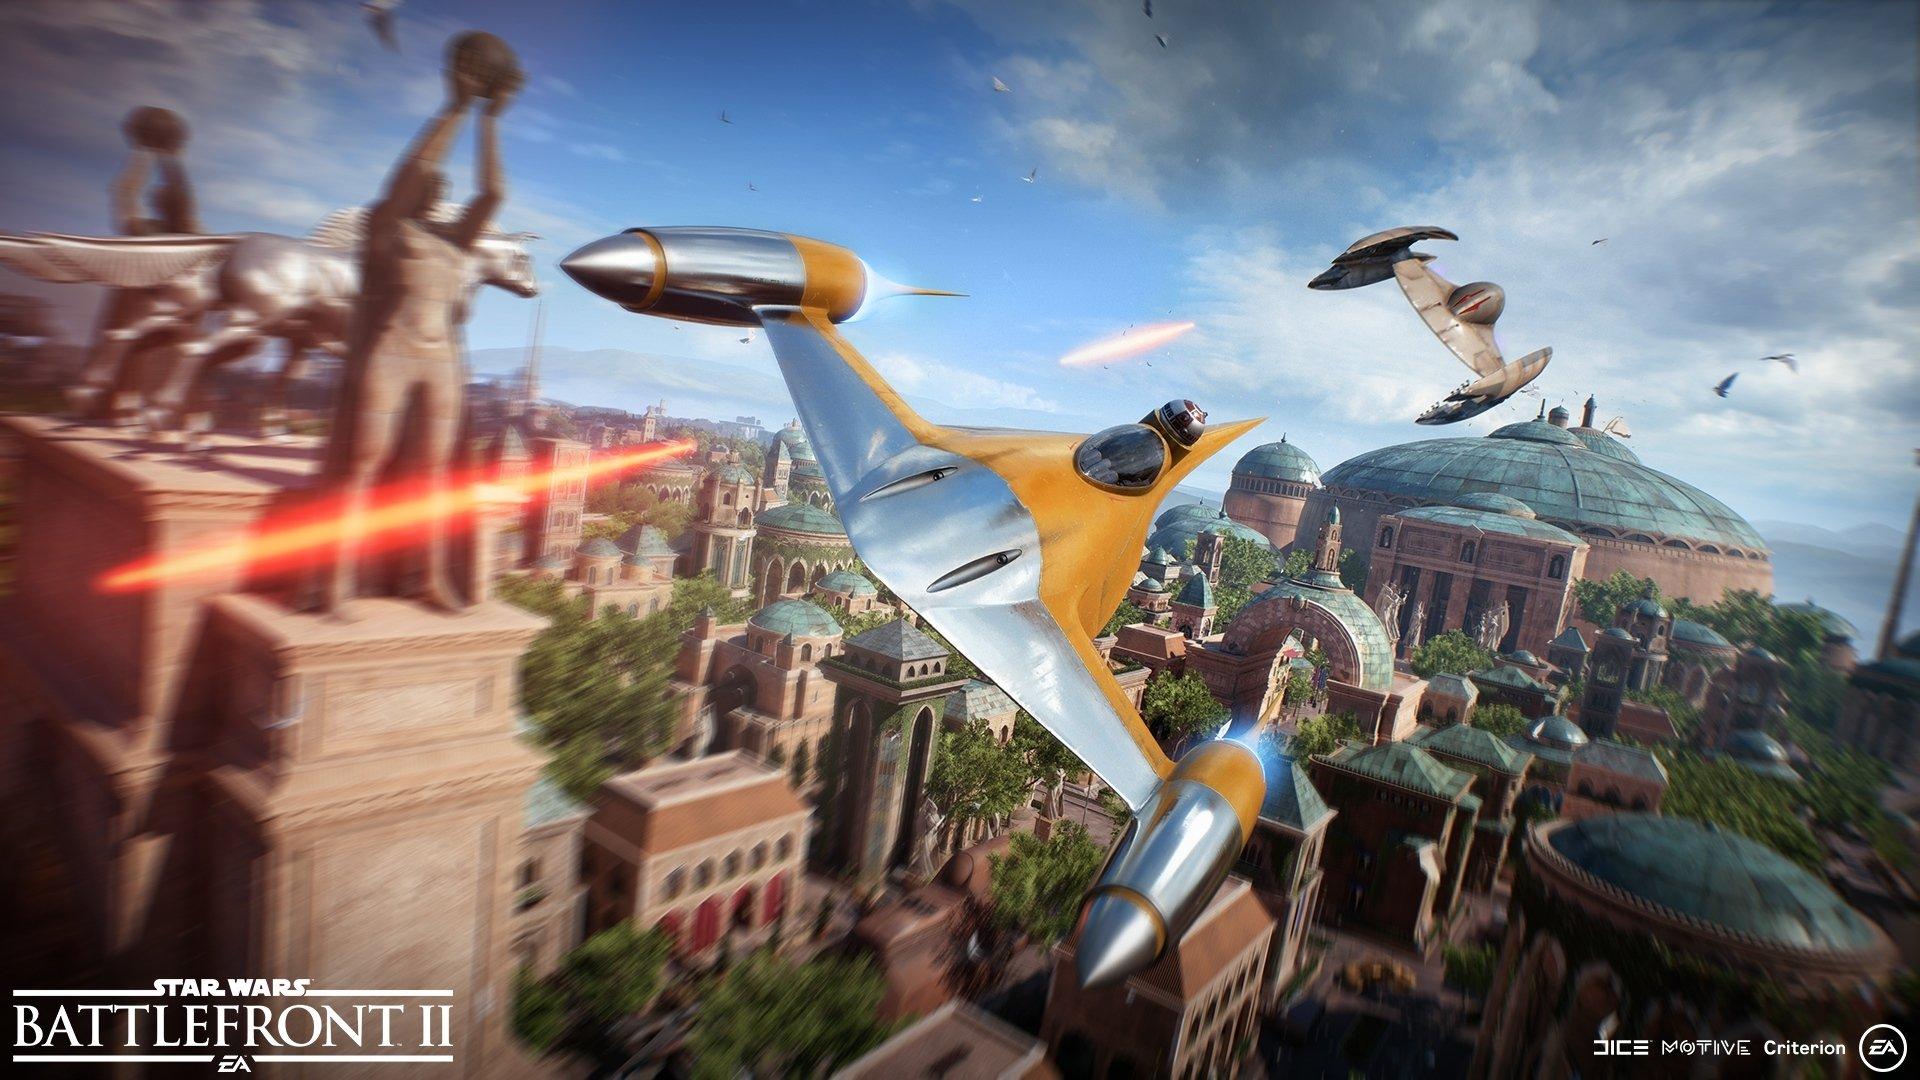 843443 Title Video Game Star Wars Battlefront Ii Star Wars Battlefront 2 Image Hd 1920x1080 Download Hd Wallpaper Wallpapertip